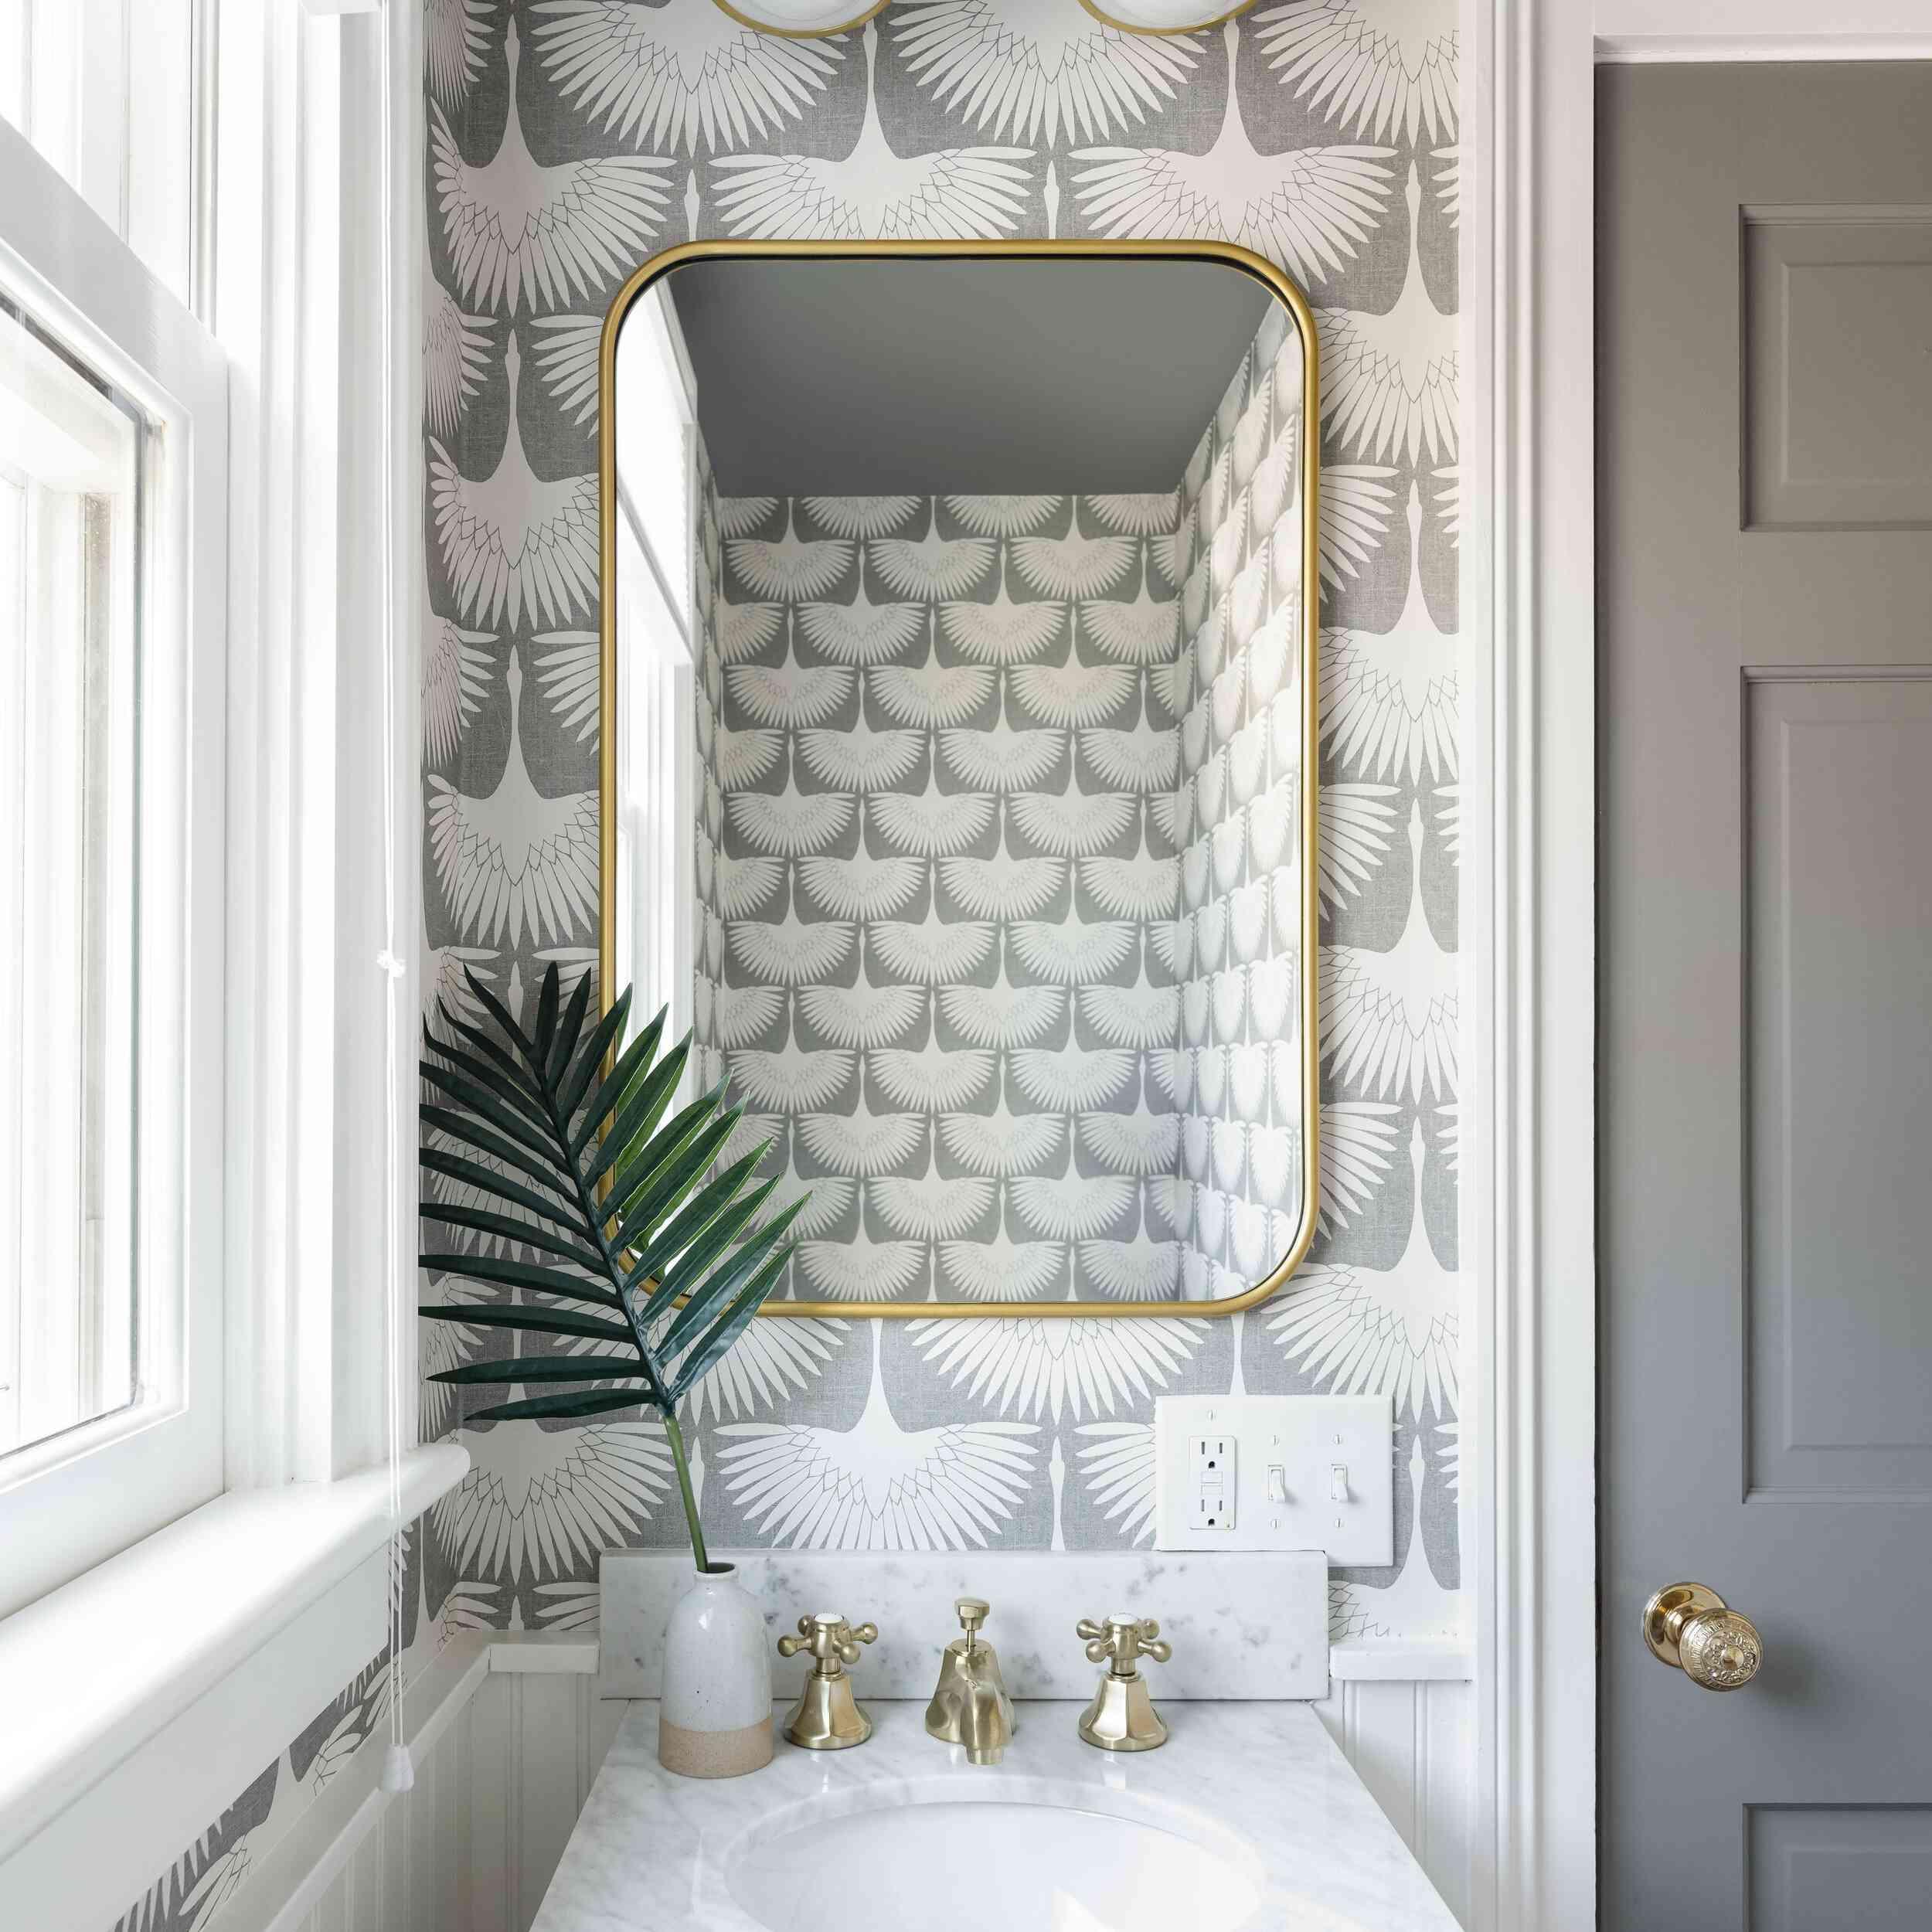 Bathroom with metallic wallpaper